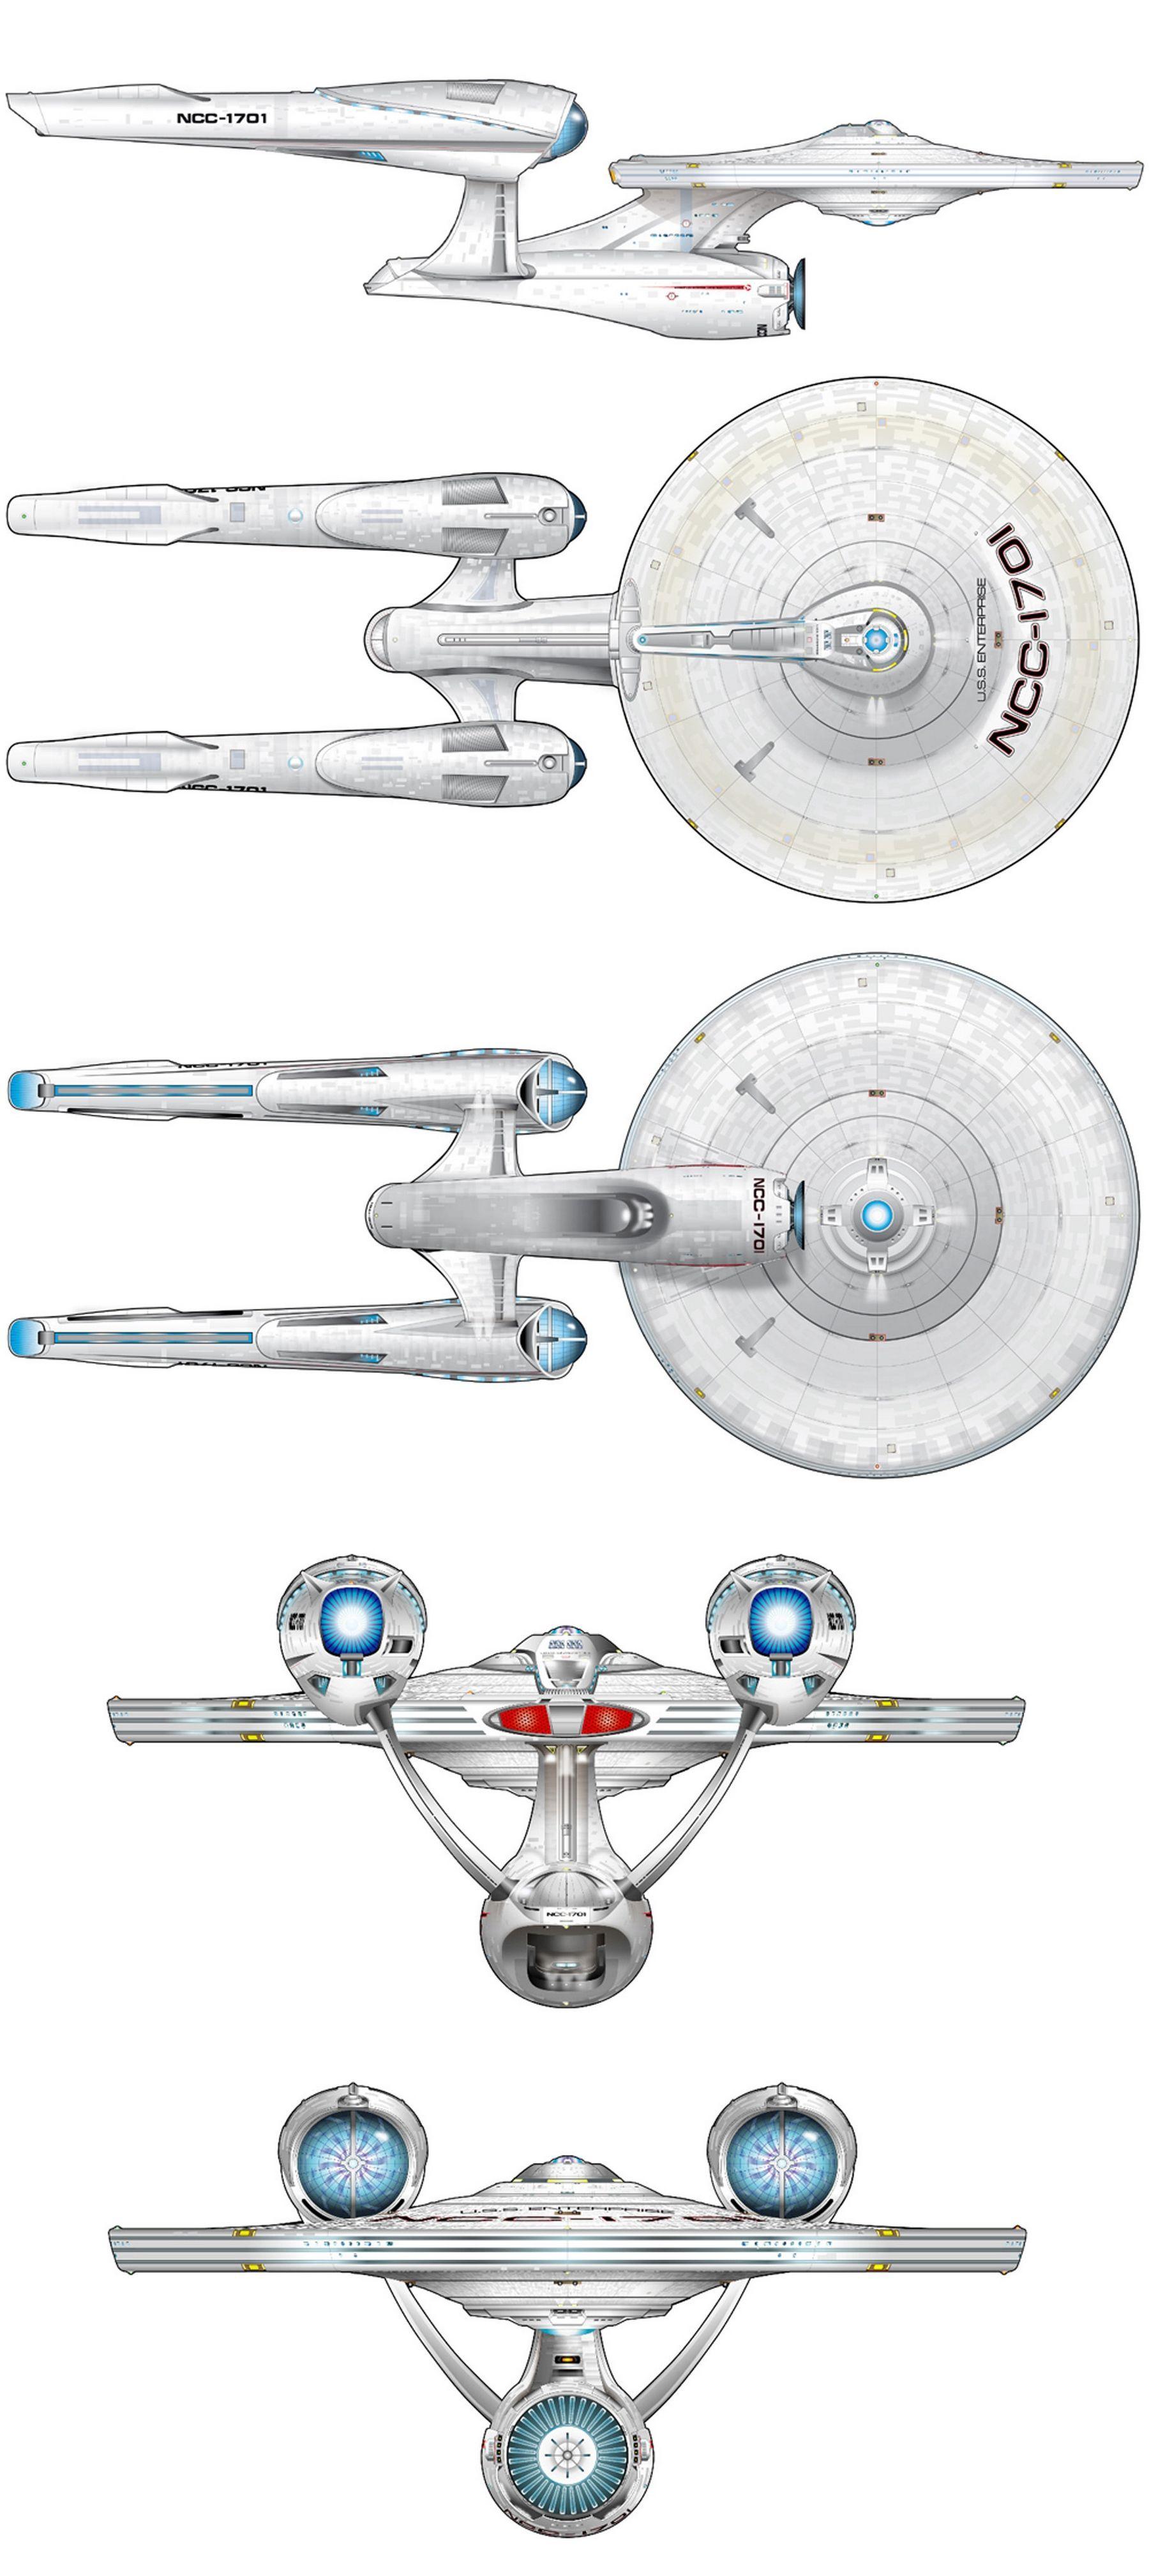 Uss enterprise ncc 1701 d galaxy class saucer separation r flickr - Uss Enterprise Ncc 1701 Constitution Class Star Trek Universe Pinterest Uss Enterprise Ncc 1701 Uss Enterprise And Star Trek